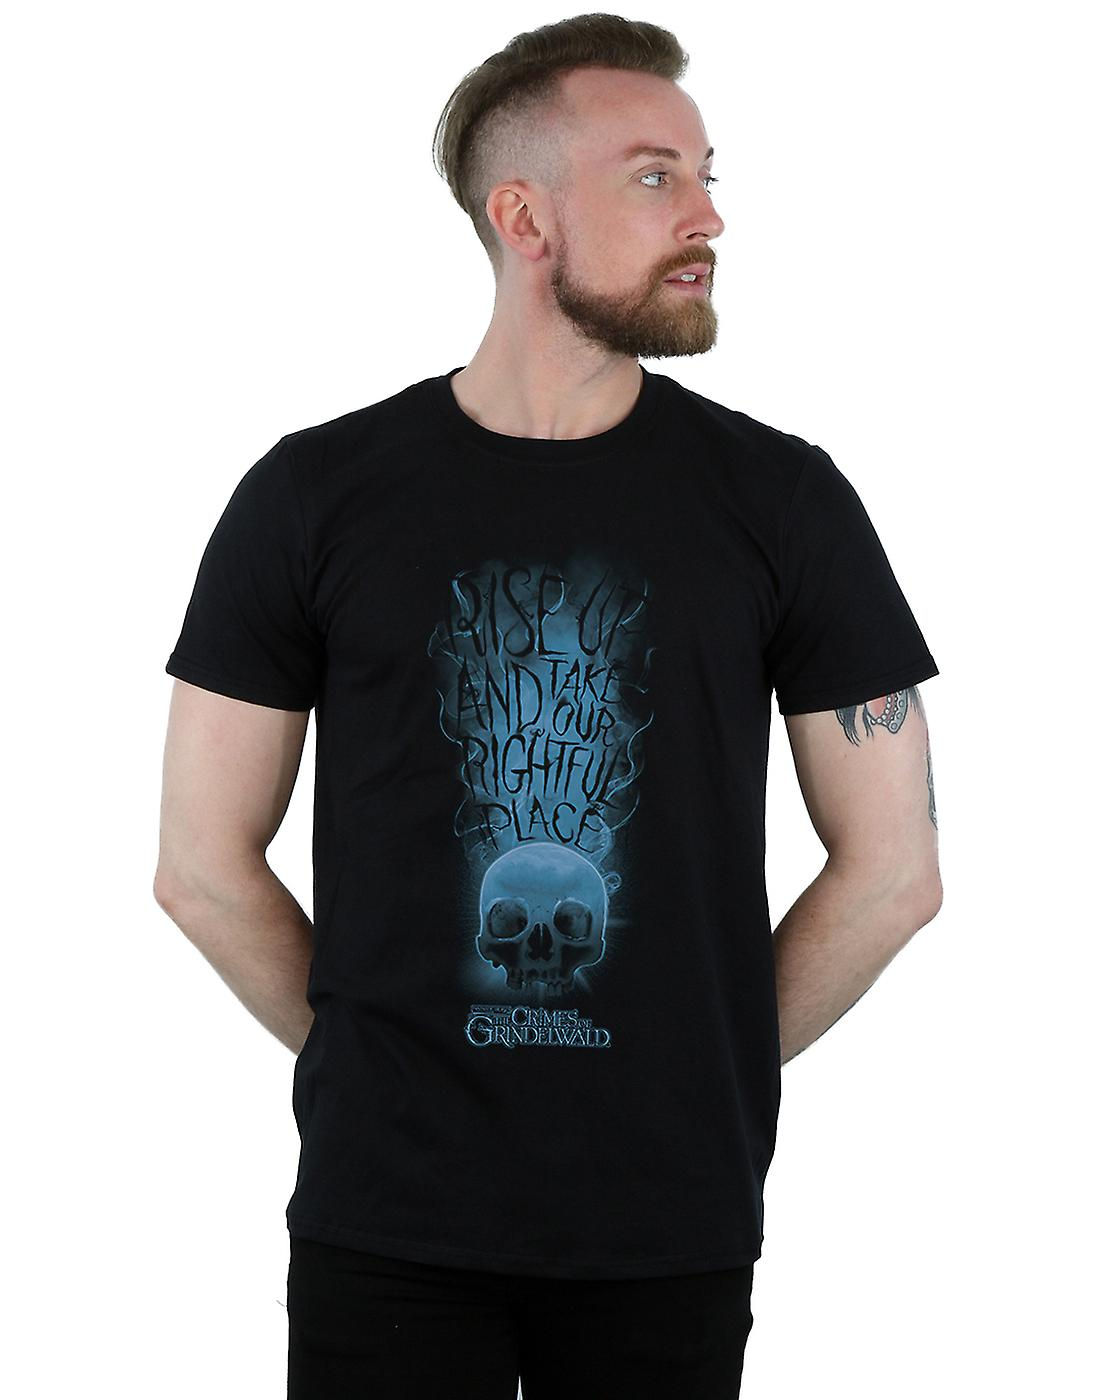 Fantastic Beasts Men's The Crimes Of Grindelwald Skull Smoke T-Shirt